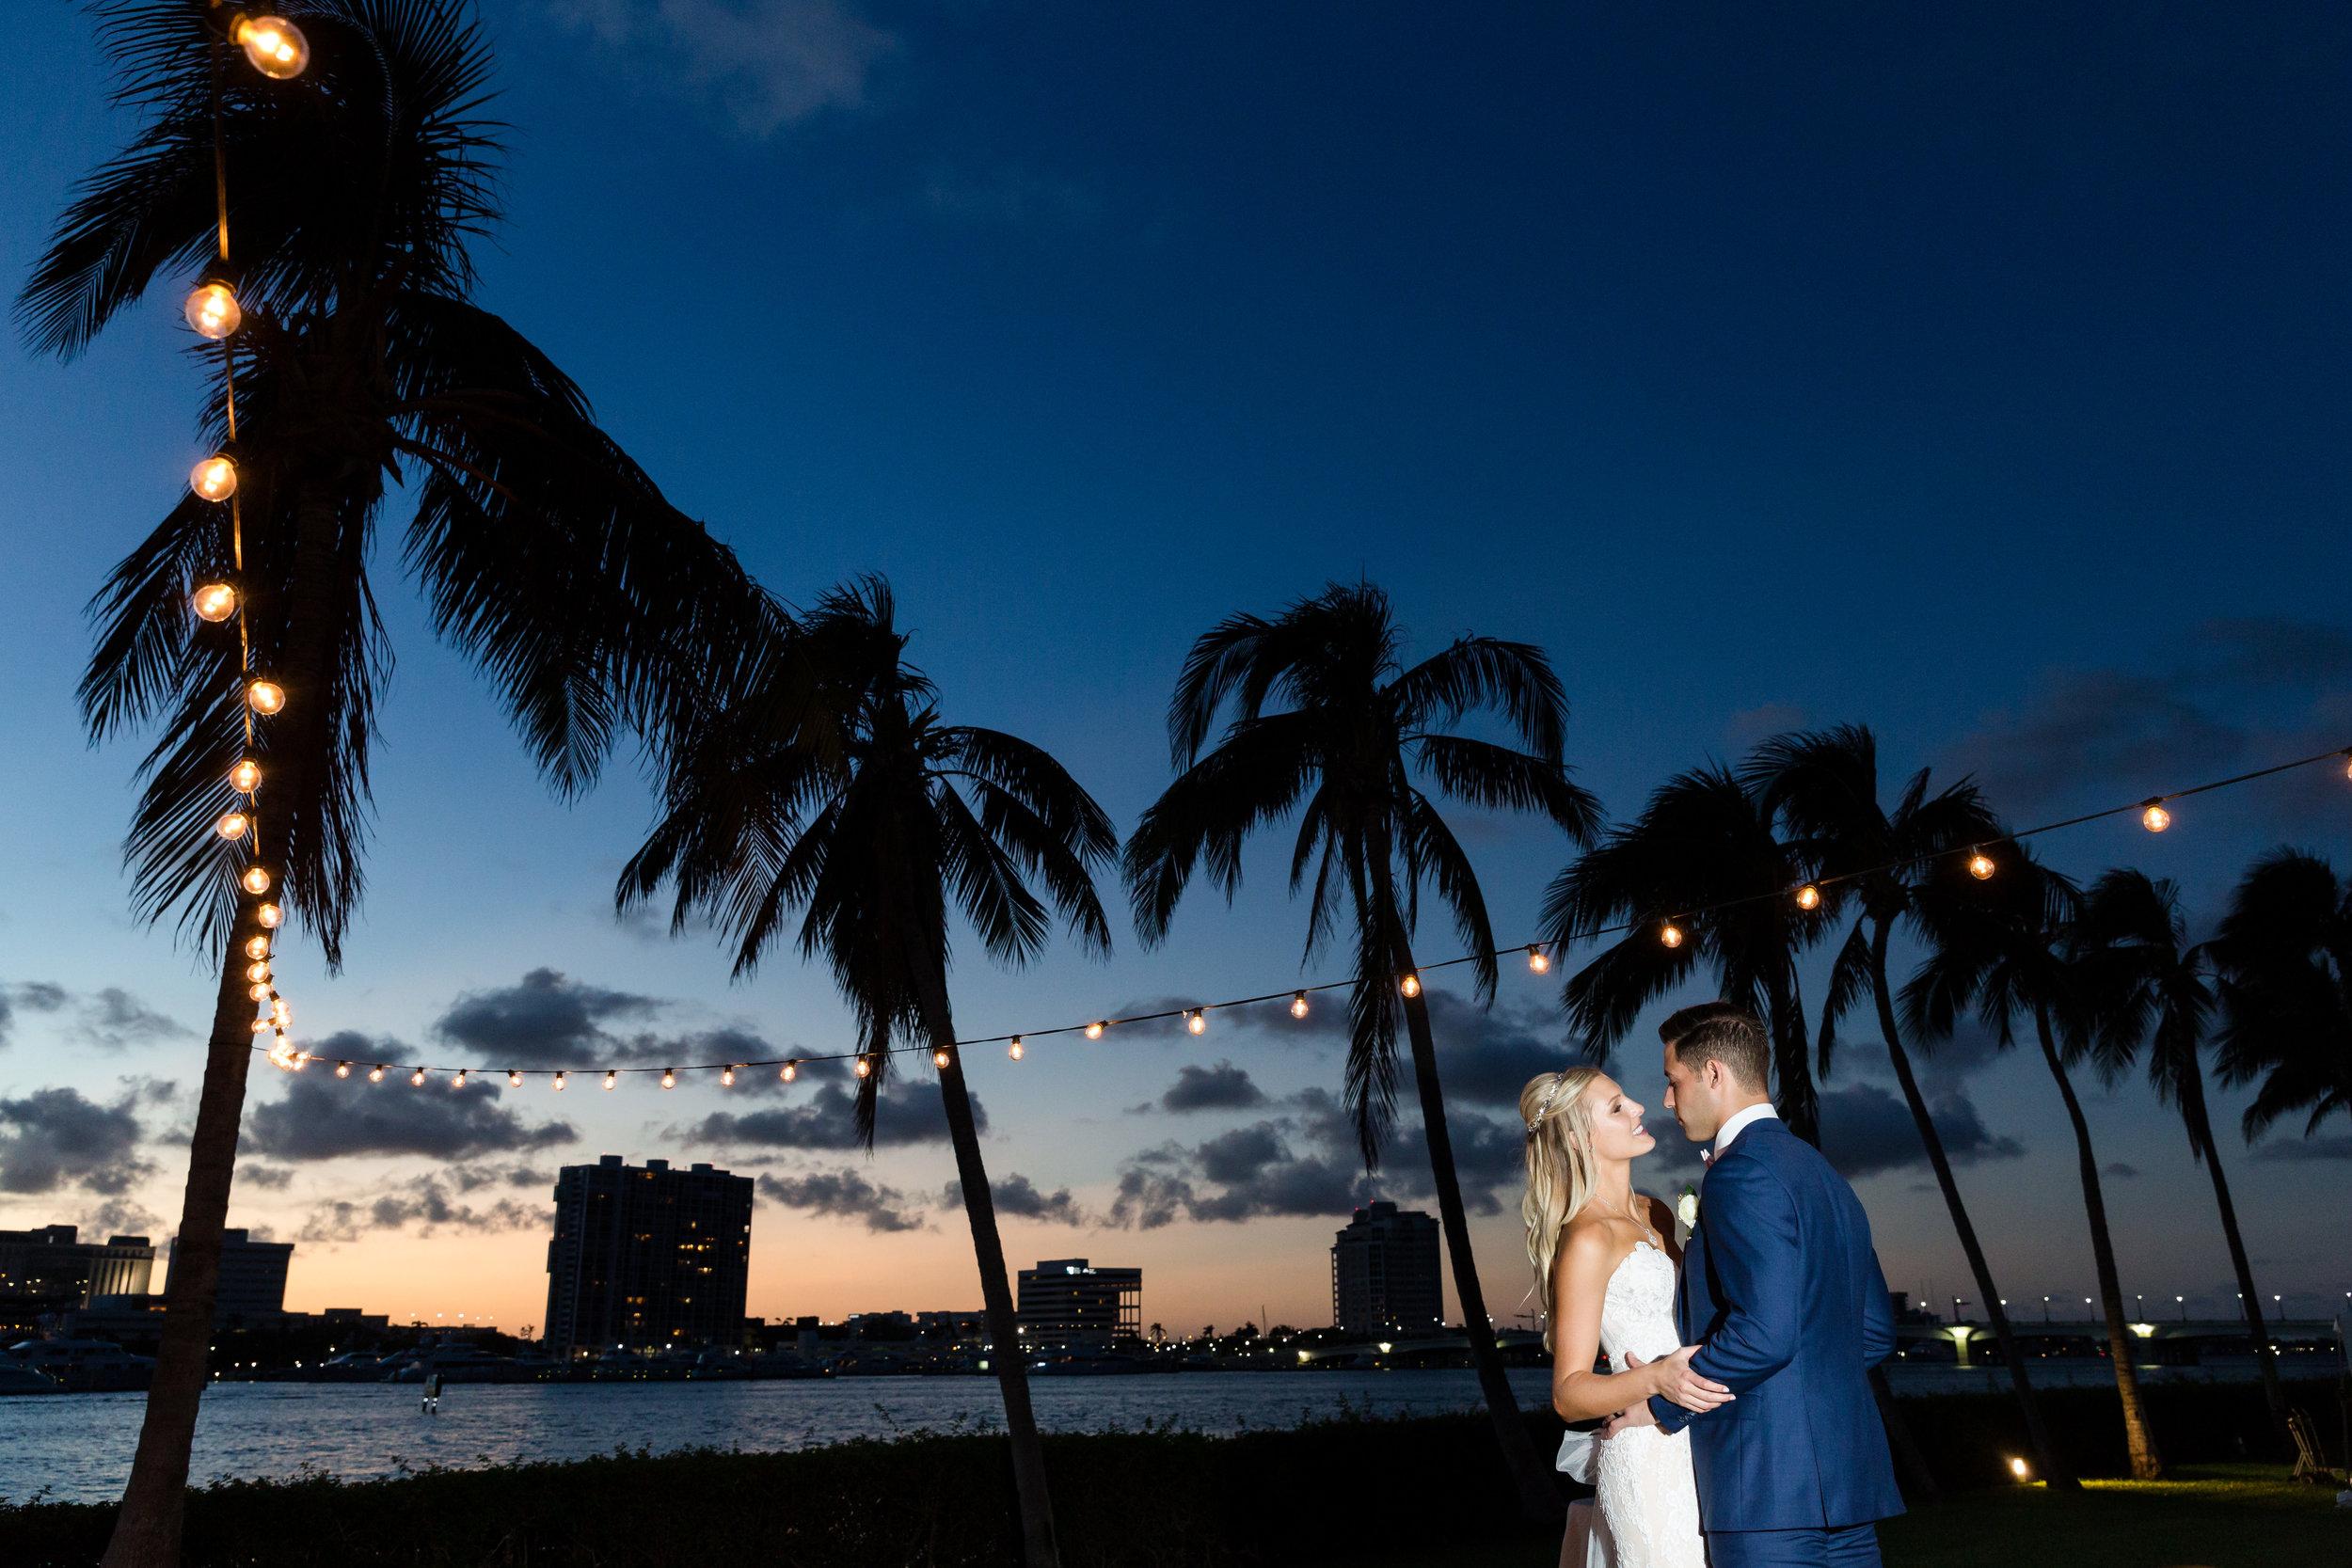 A Henry Morrison Flagler Museum Fall Wedding - The Overwhelmed Bride Wedding Inspiration Blog